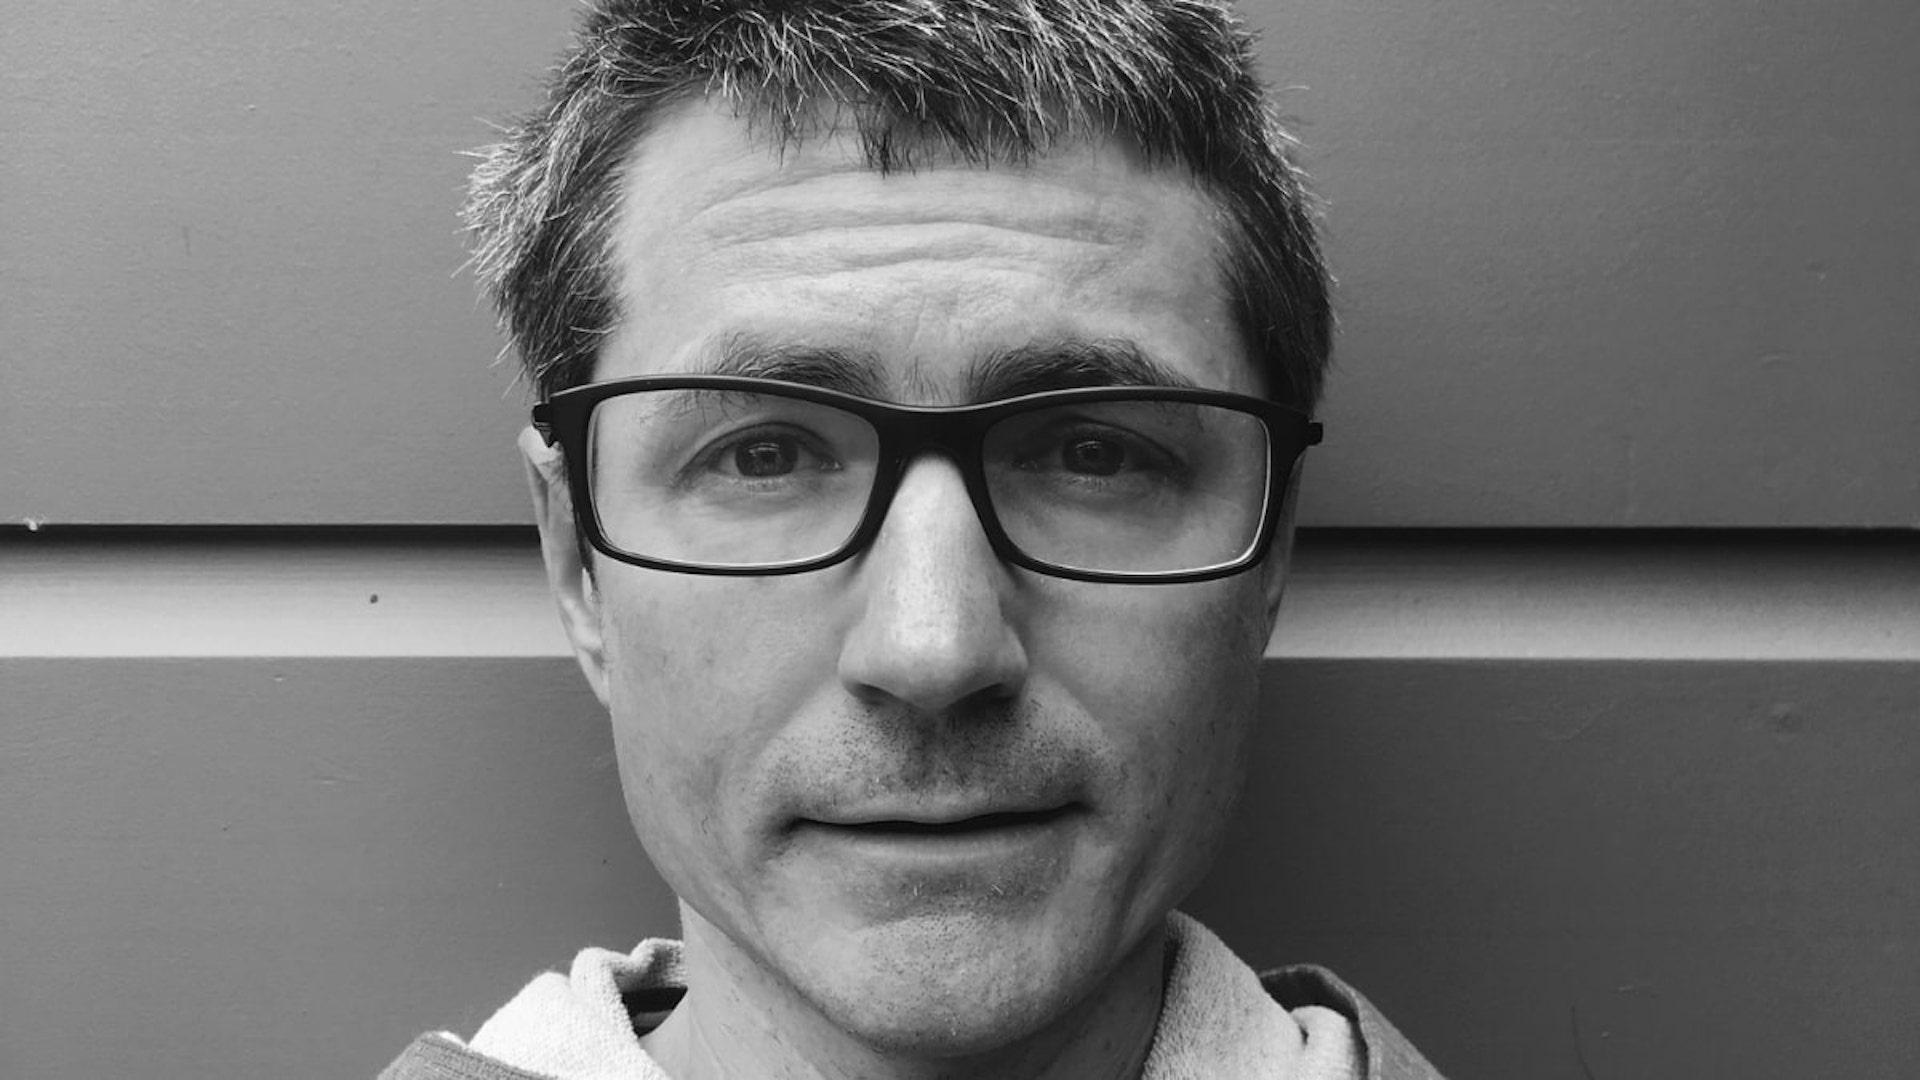 Black and white photo of John Cutler.